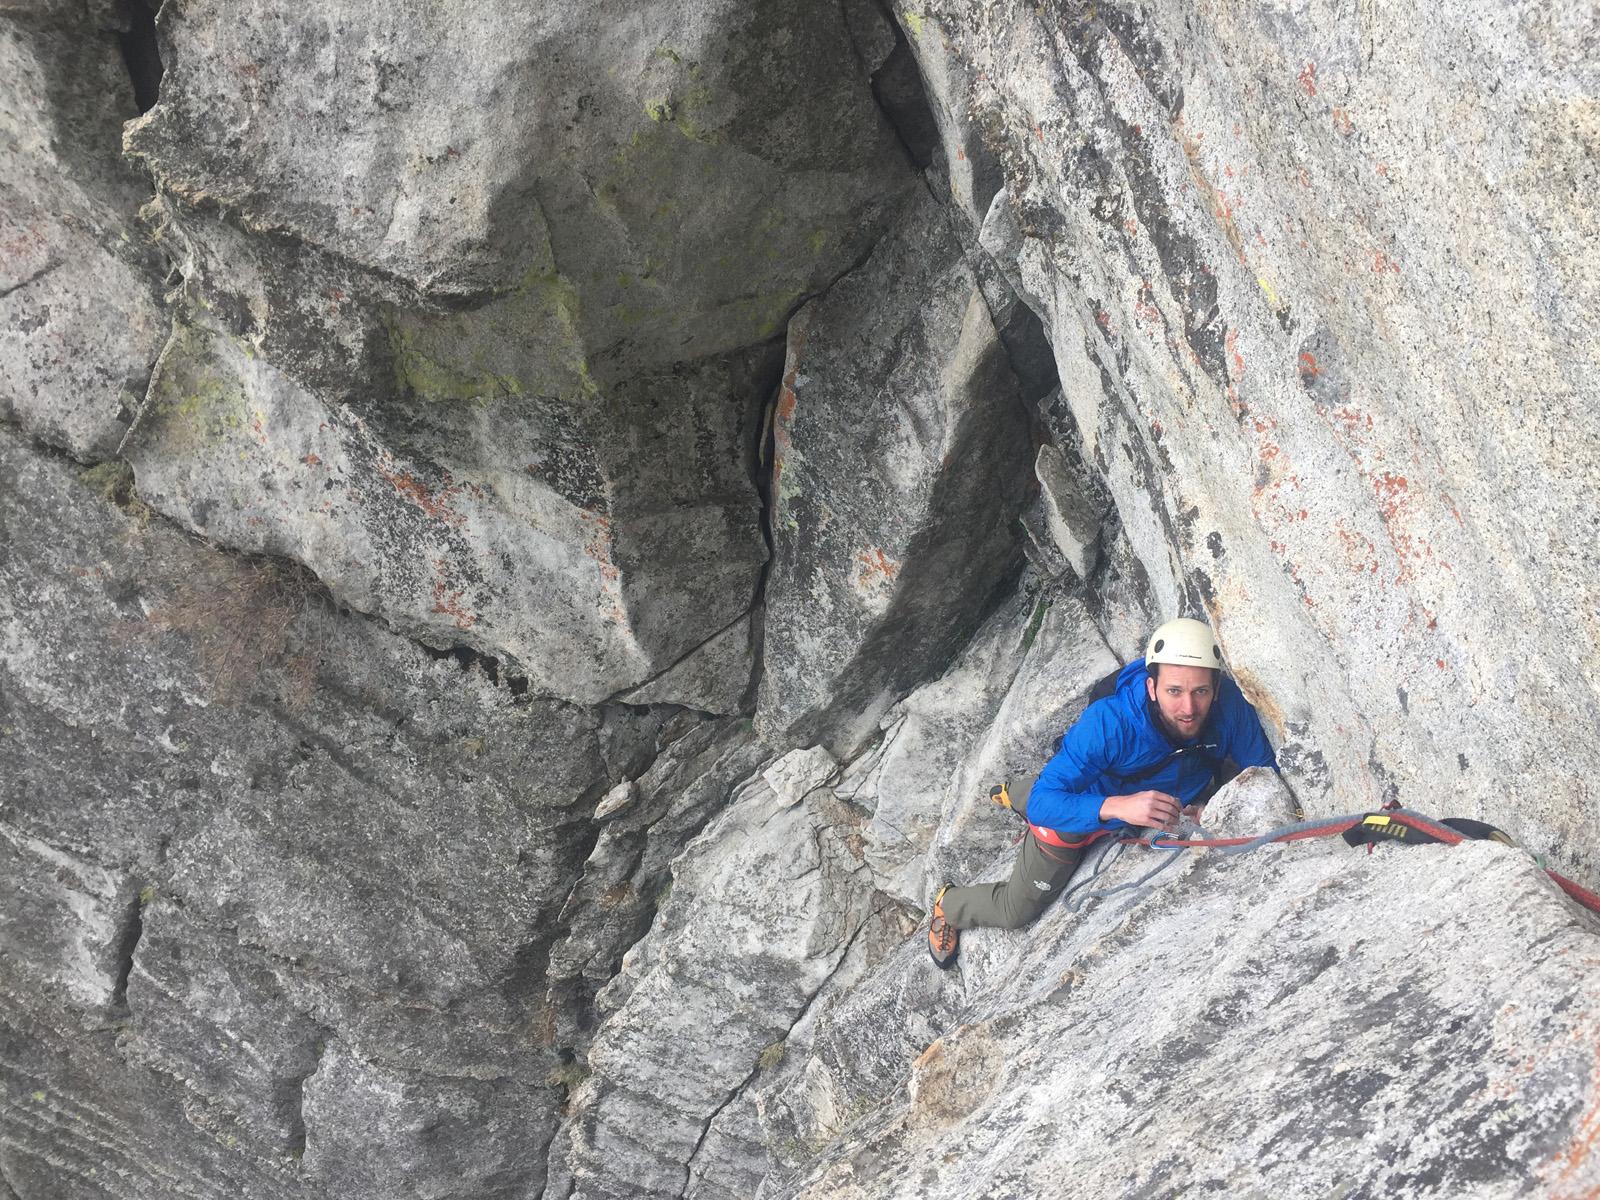 man in blue jacket rock climbing